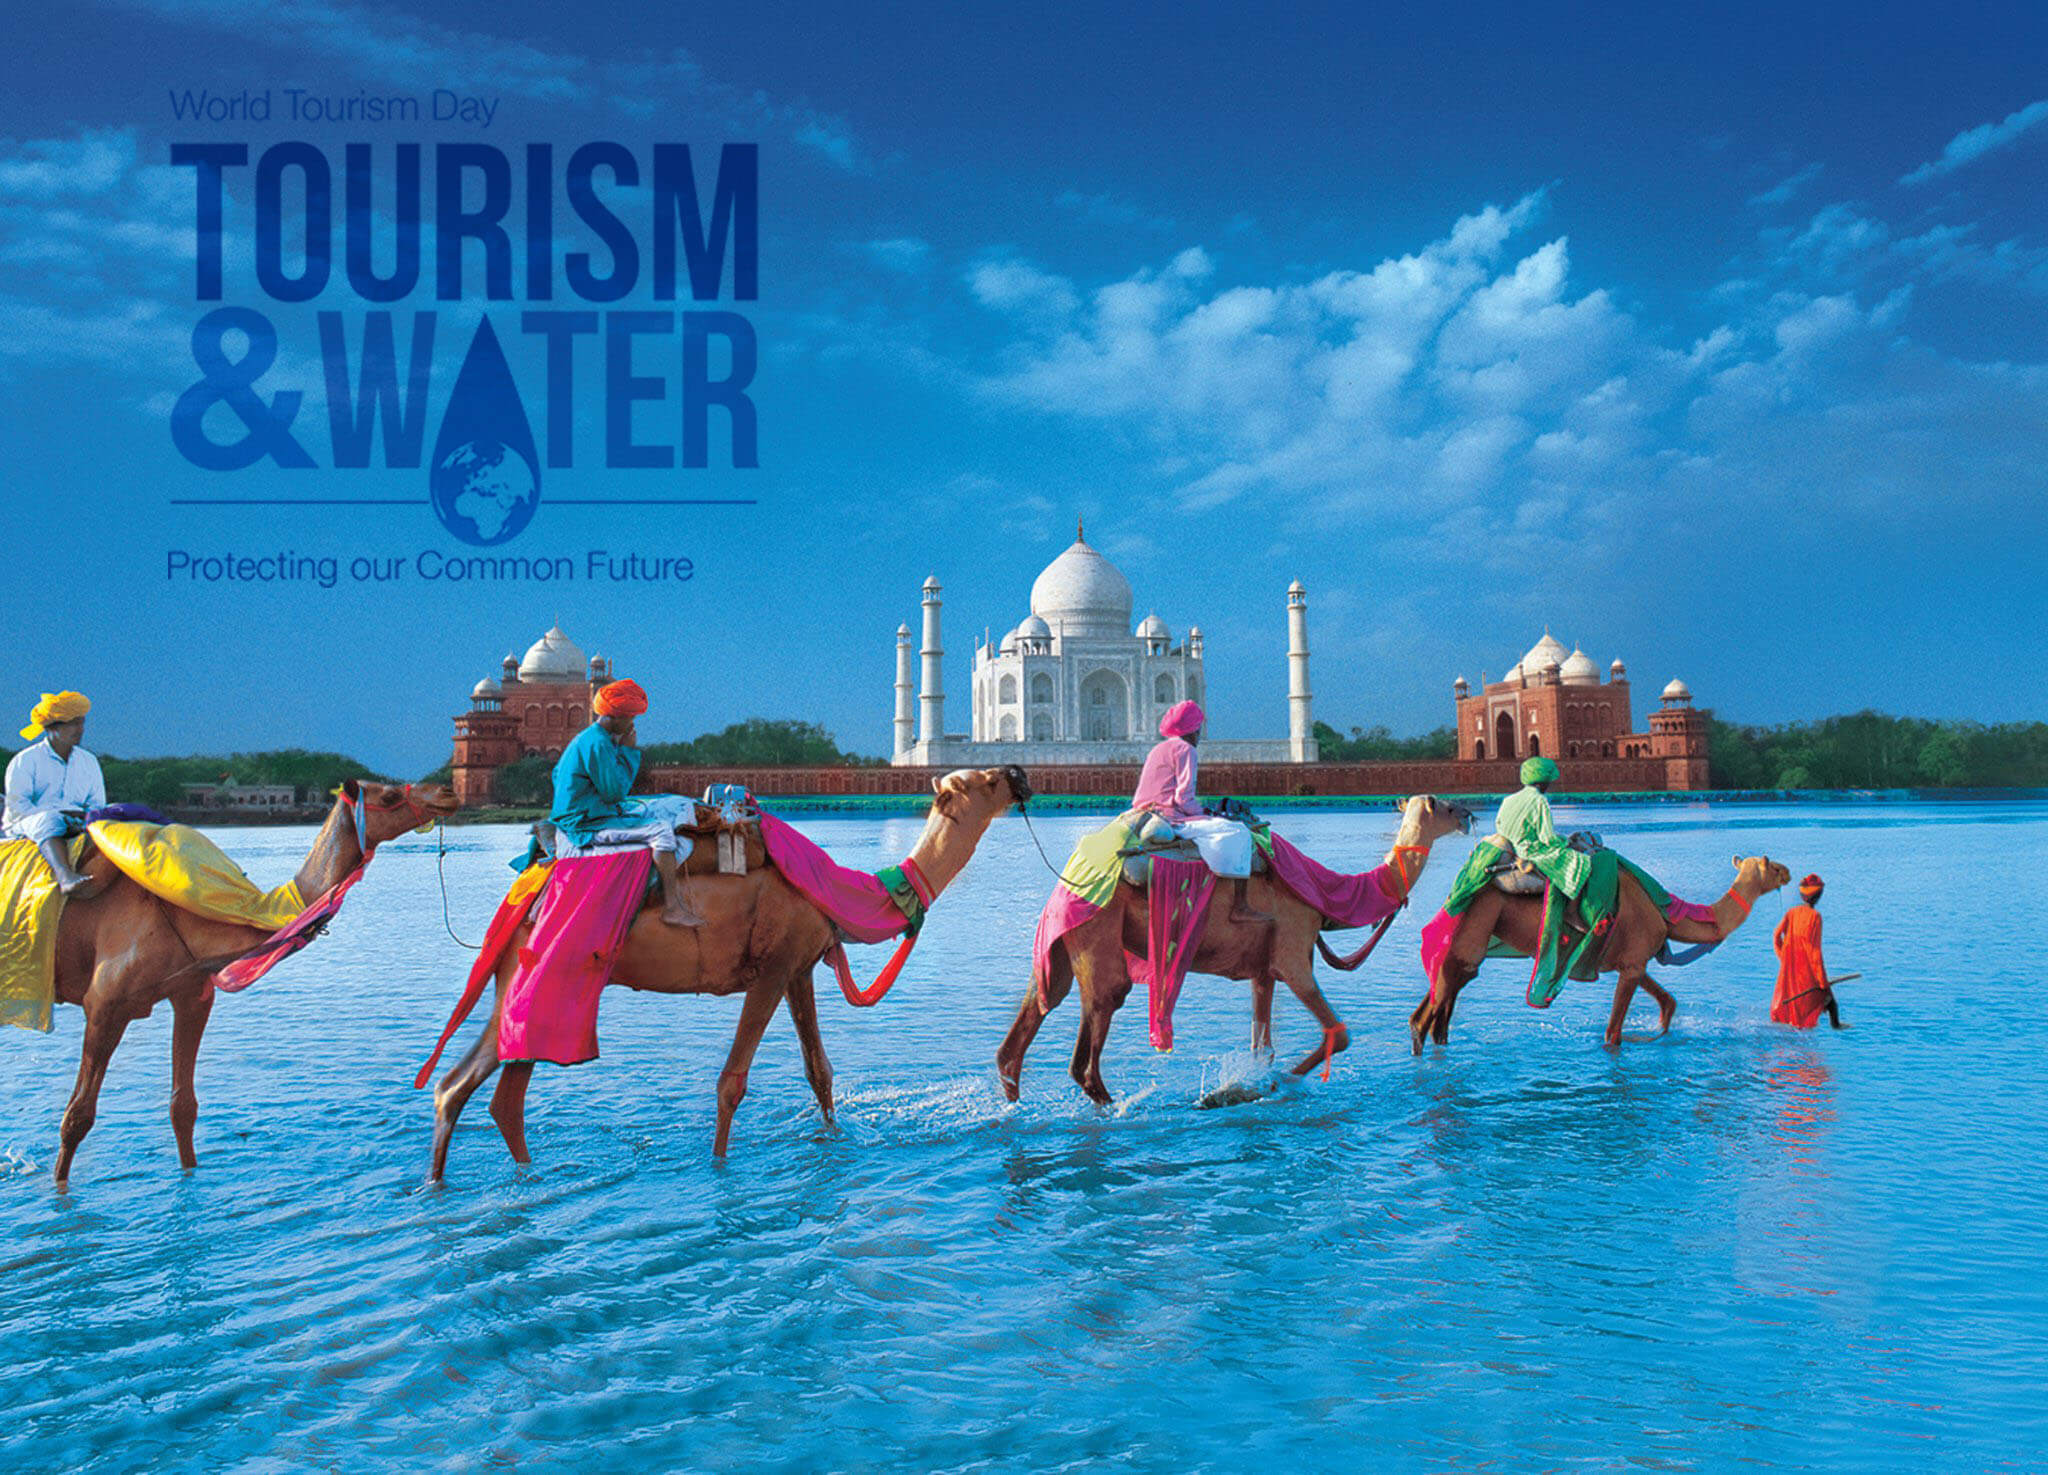 world tourism day 27th september taj mahal